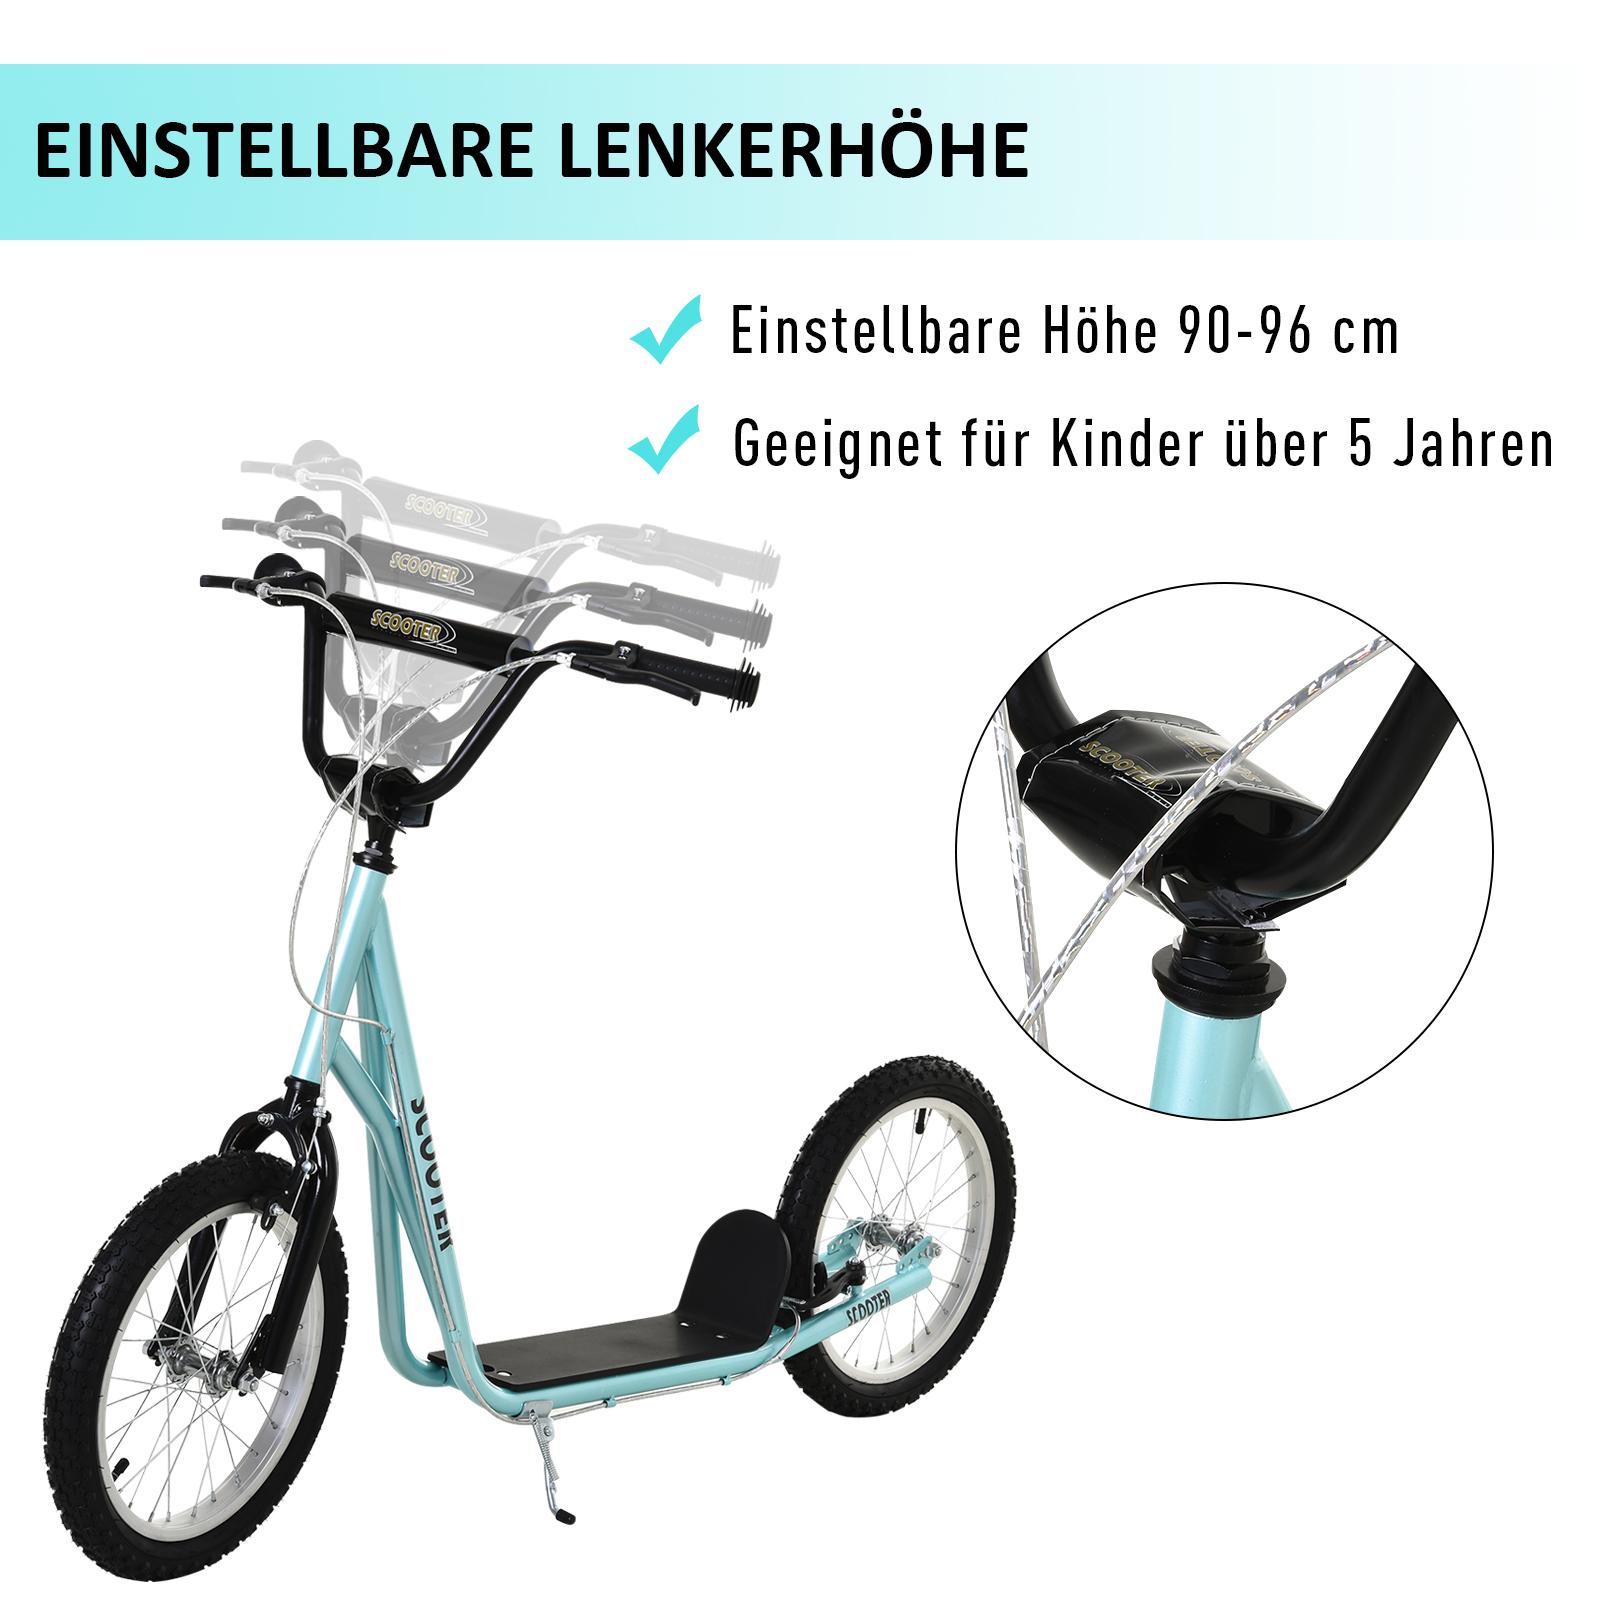 Indexbild 11 - HOMCOM-Tretroller-Kinderroller-Scooter-Cityroller-Roller-verstellbar-Blau-Gruen